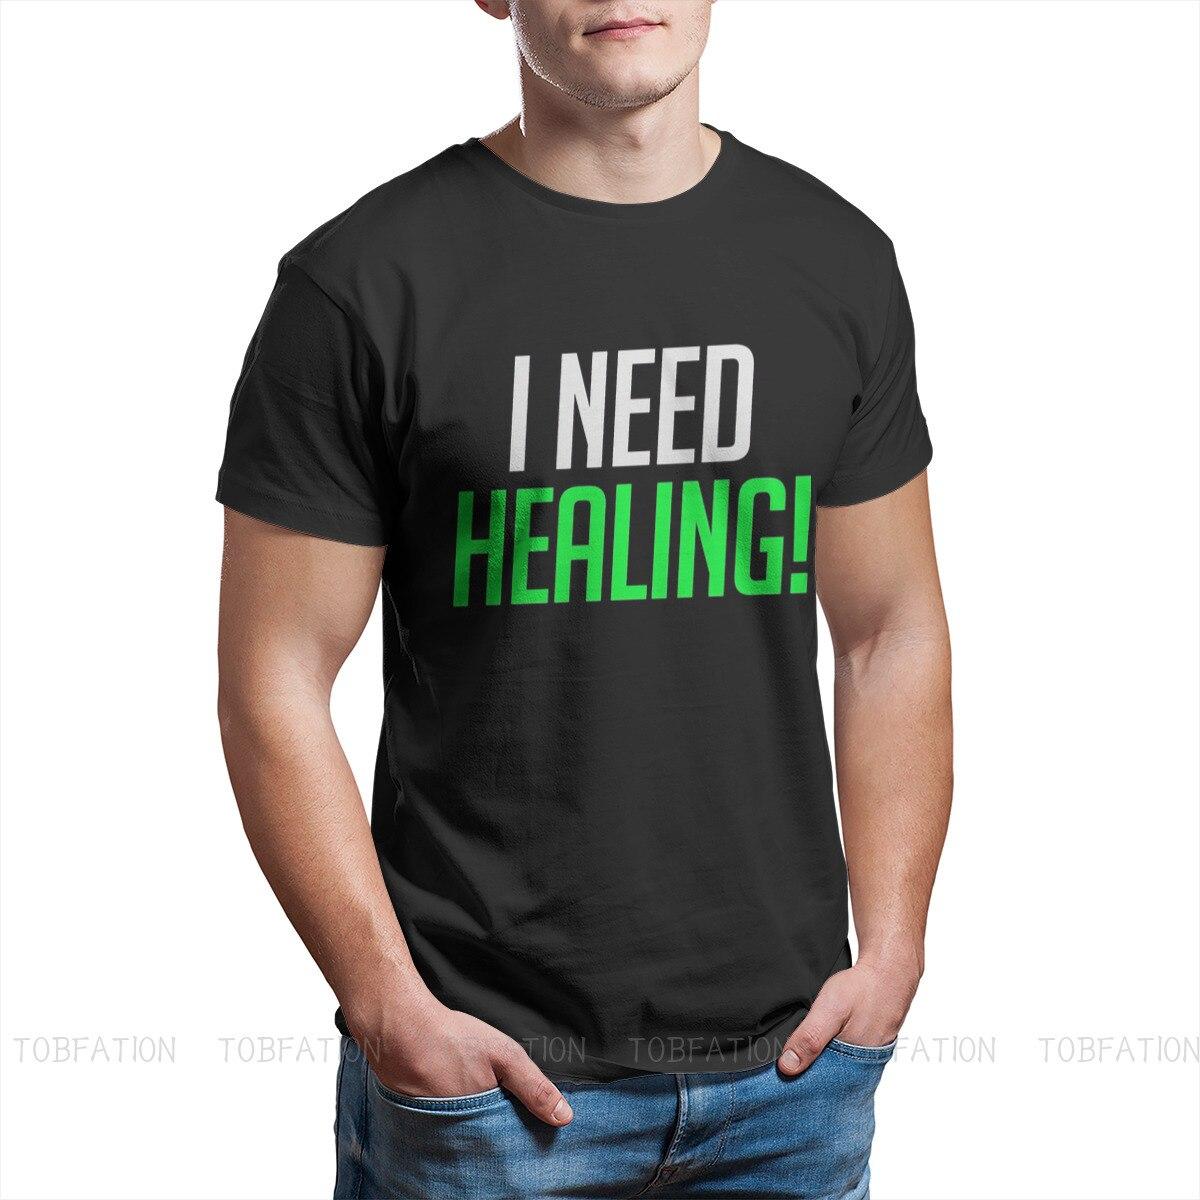 I Need Healing! Unique TShirt Overwatch Comfortable Hip Hop Gift Idea  T Shirt Short Sleeve Hot Sale 4